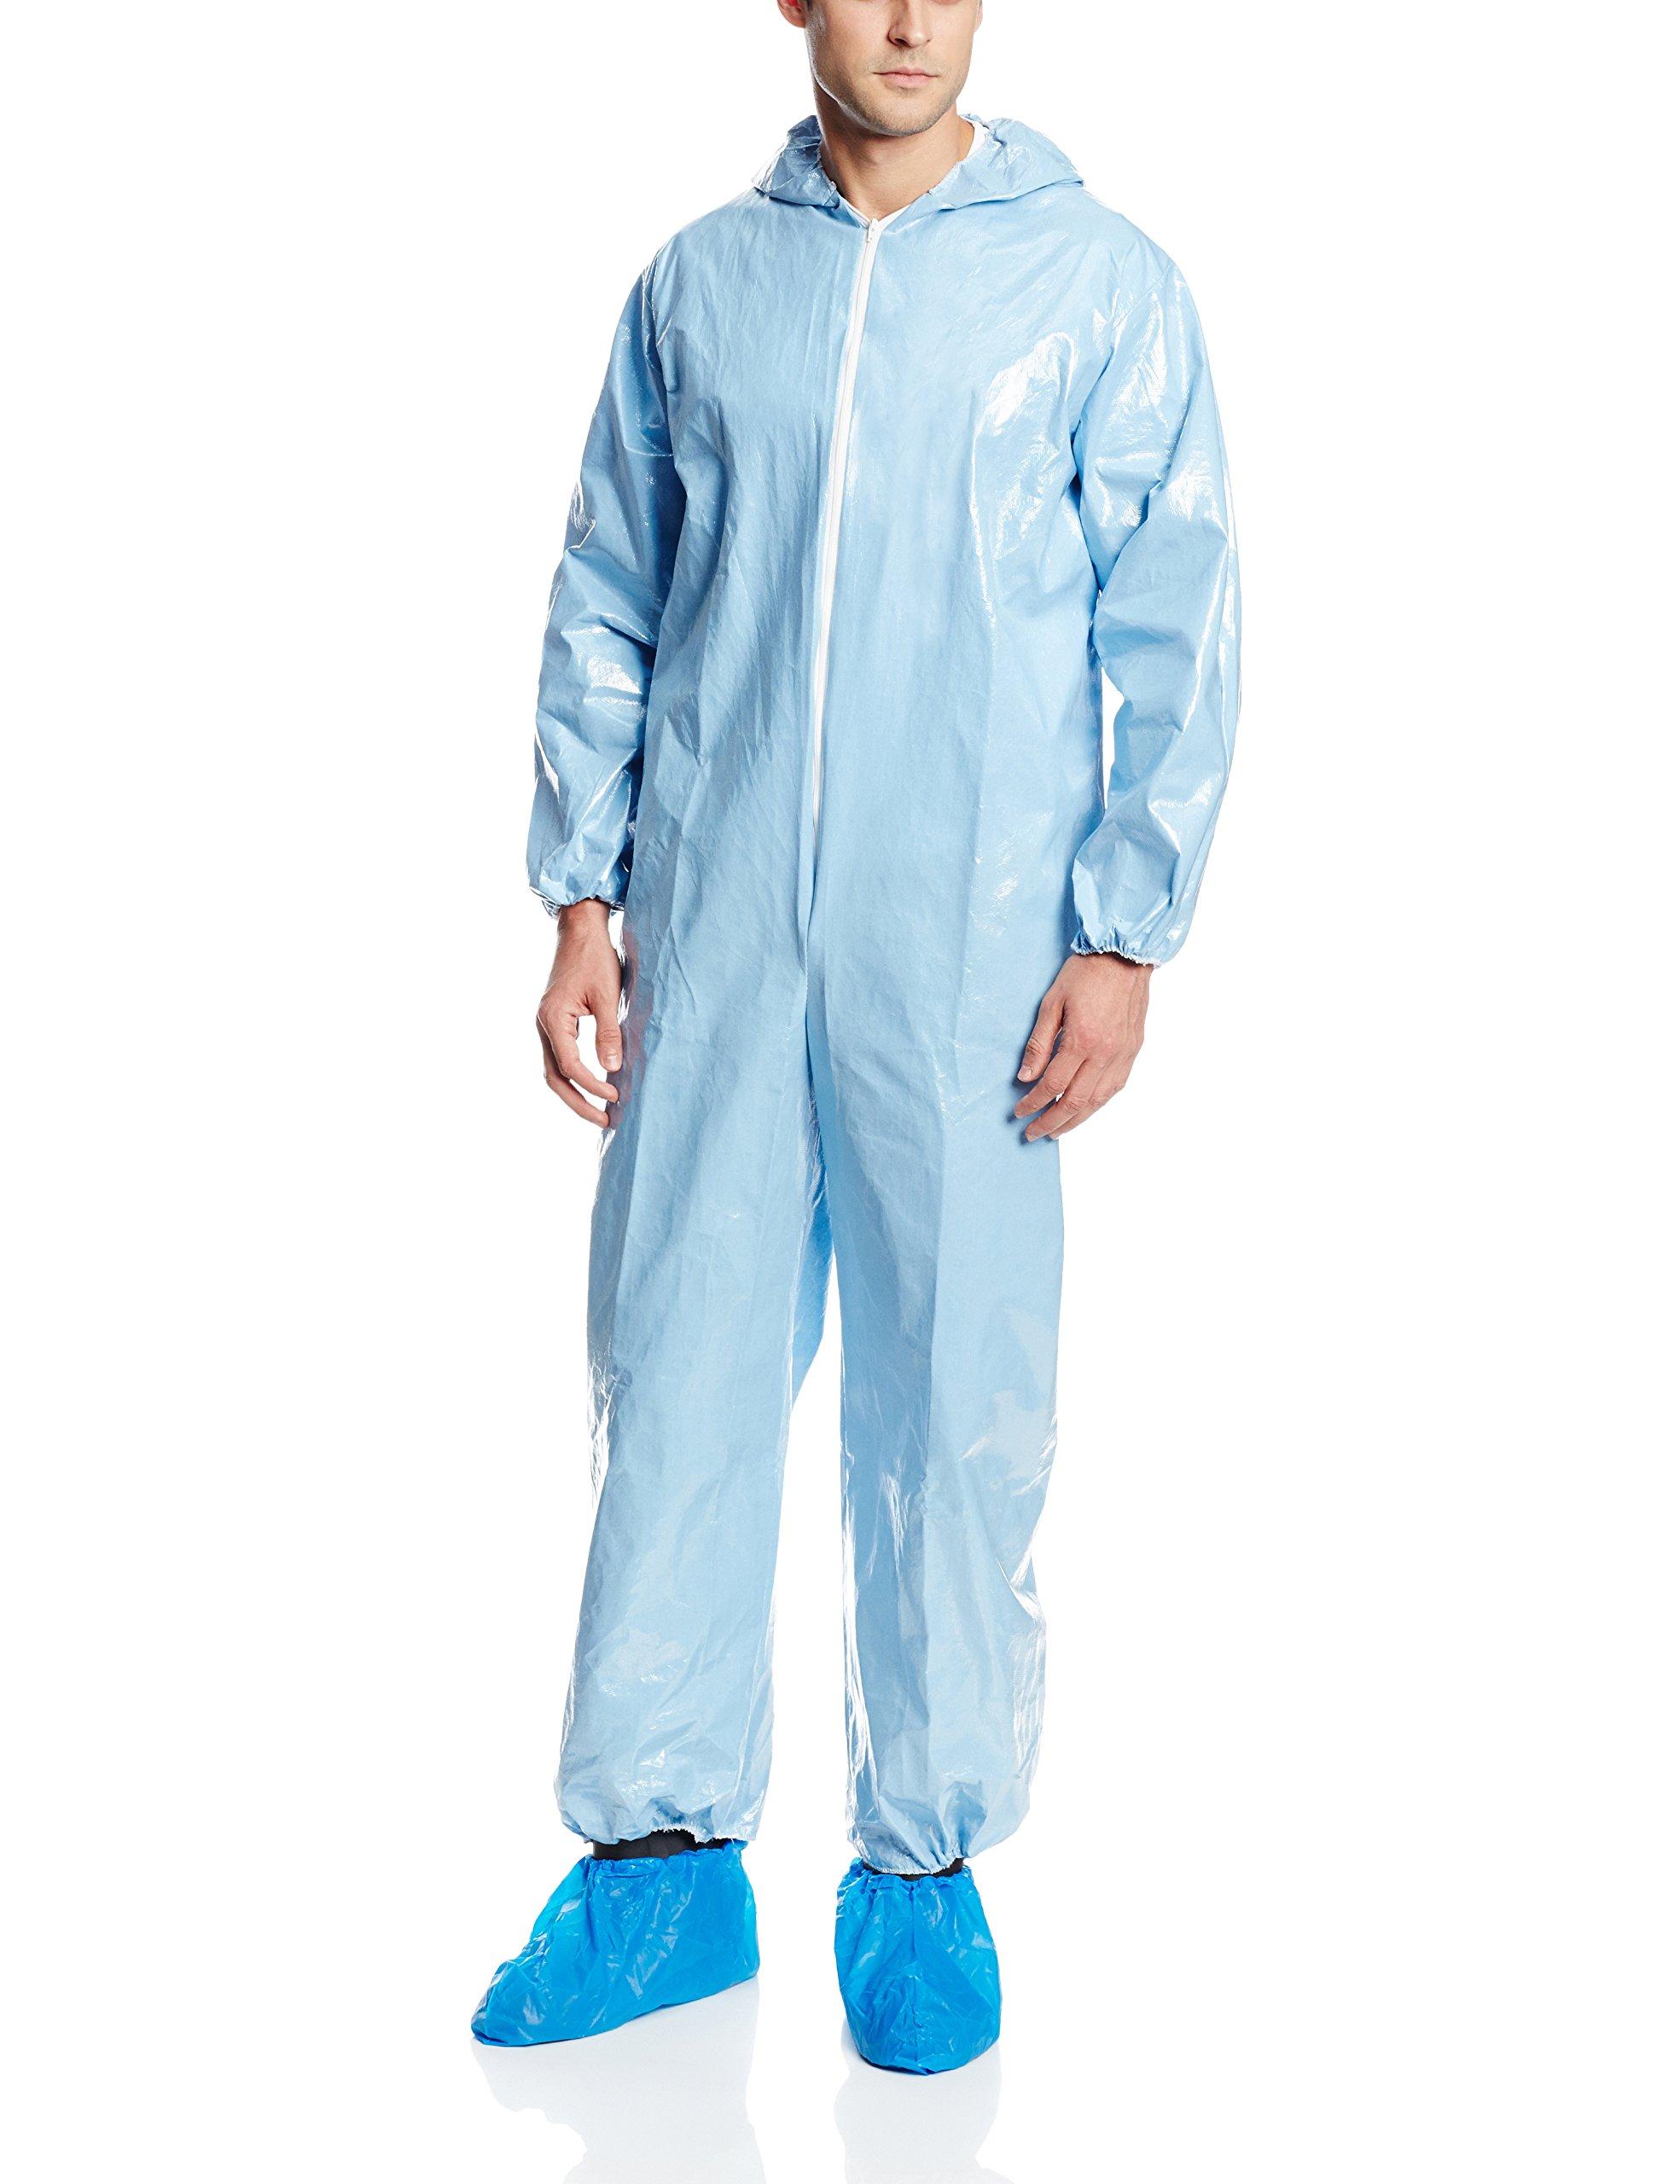 Bulwark Flame Resistant PVC Coated Chemical Splash Disposable Hooded Coverall, Sky Blue, Medium